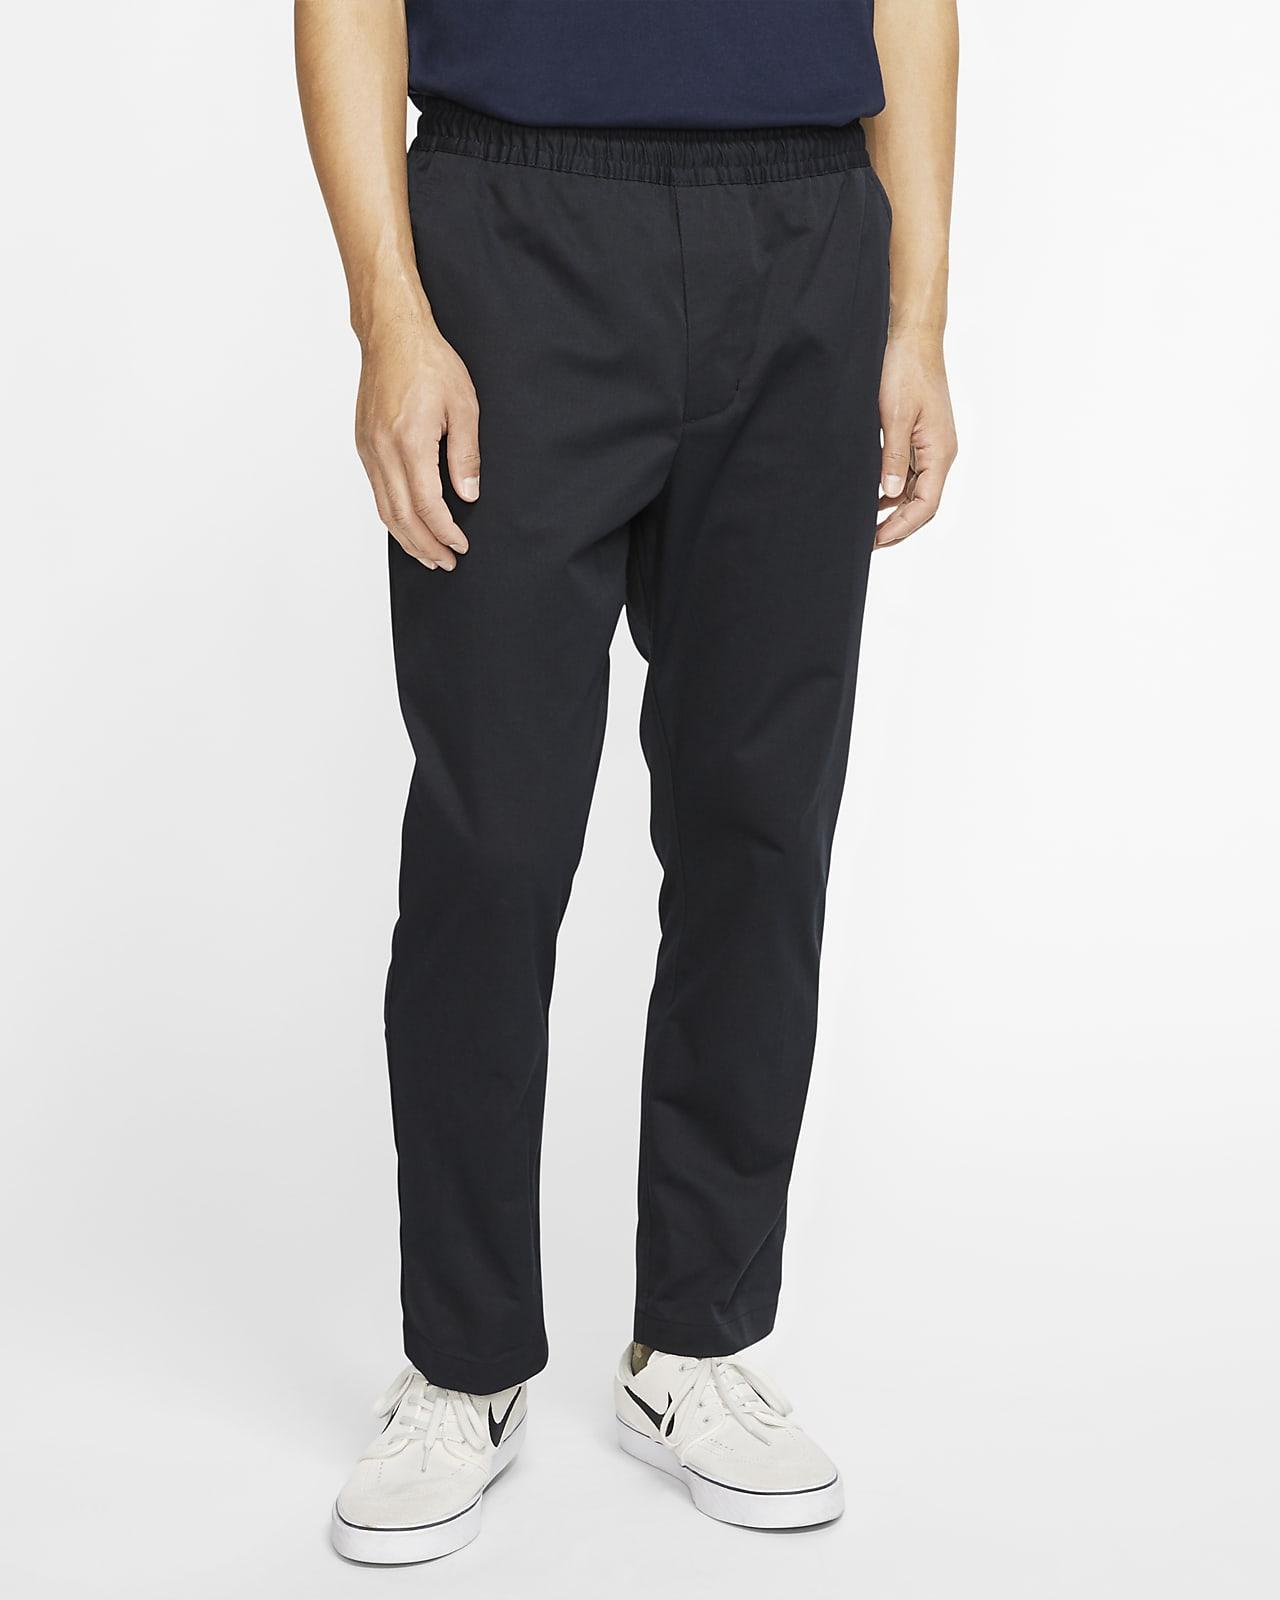 Nike SB Dri-FIT Men's Skate Chino Pants